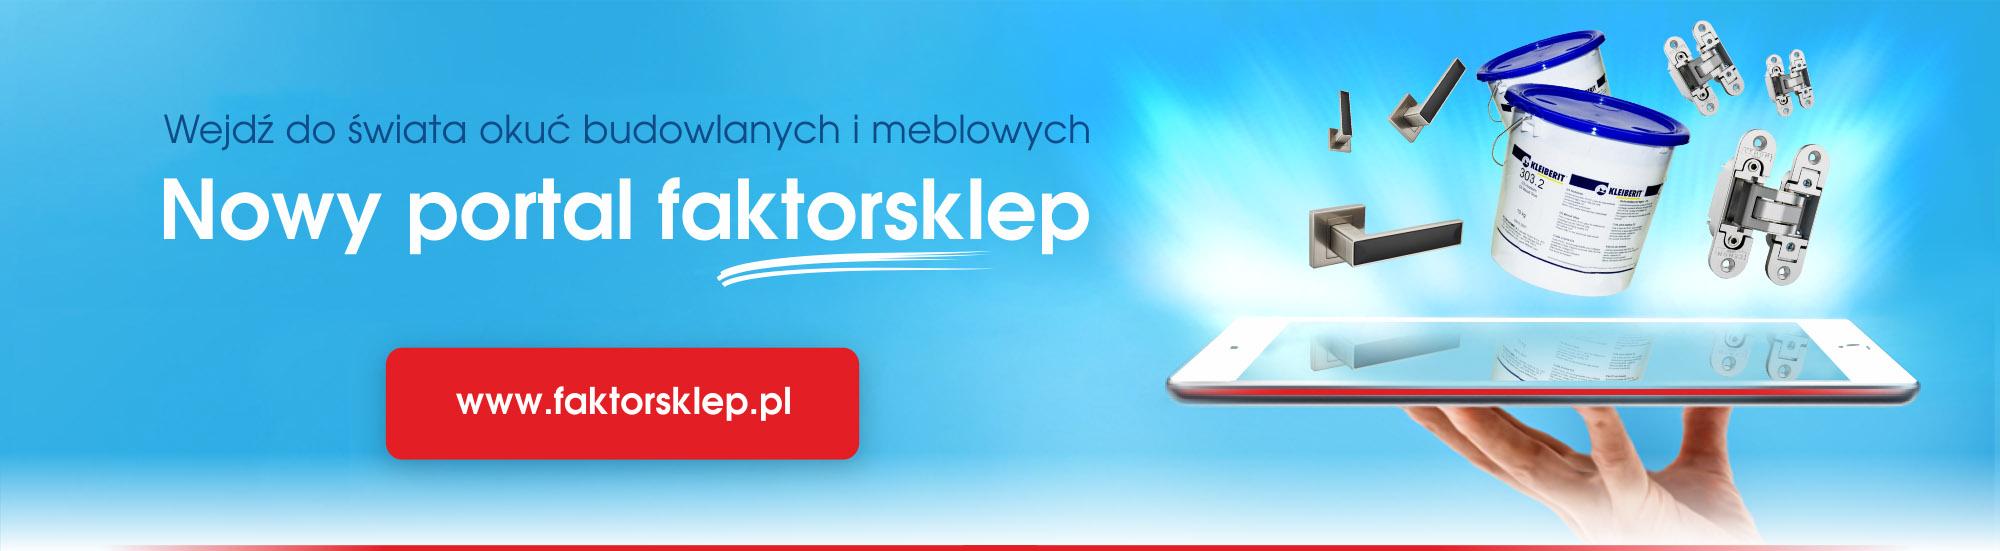 zapraszamy na faktorsklep.pl